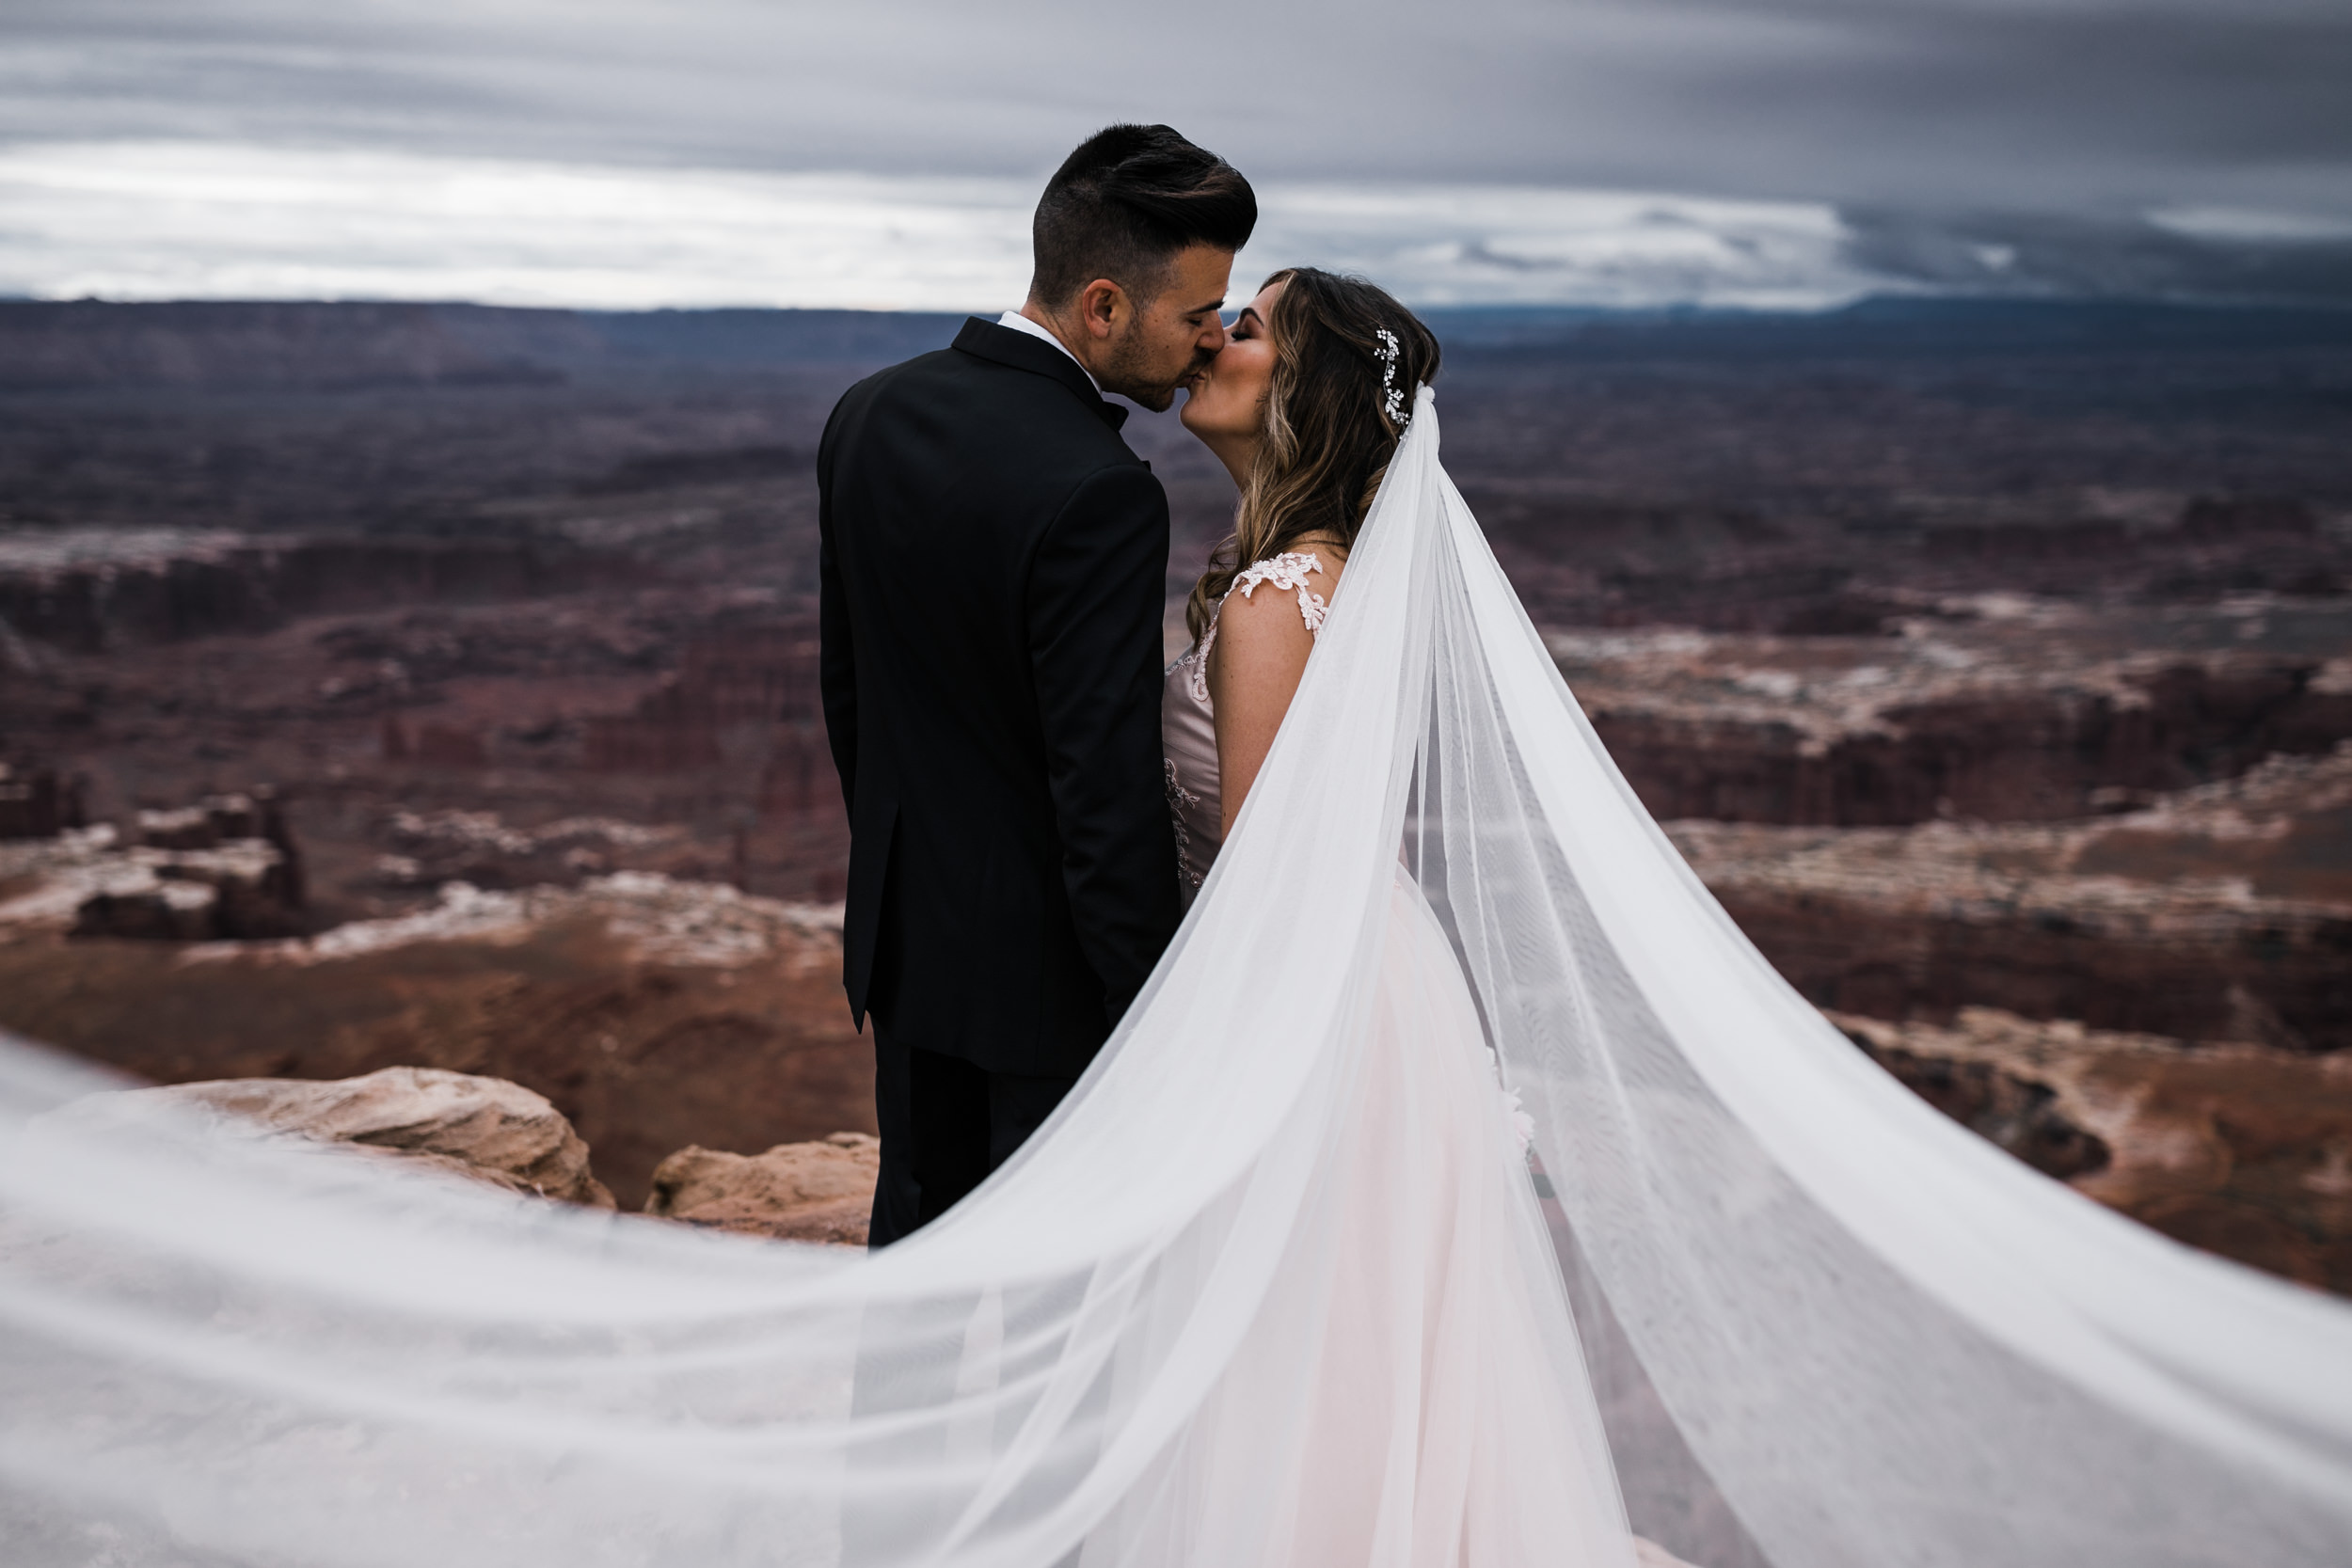 Hearnes-Elopement-Photography-Canyonlands-National-Park-Moab-Wedding-15.jpg